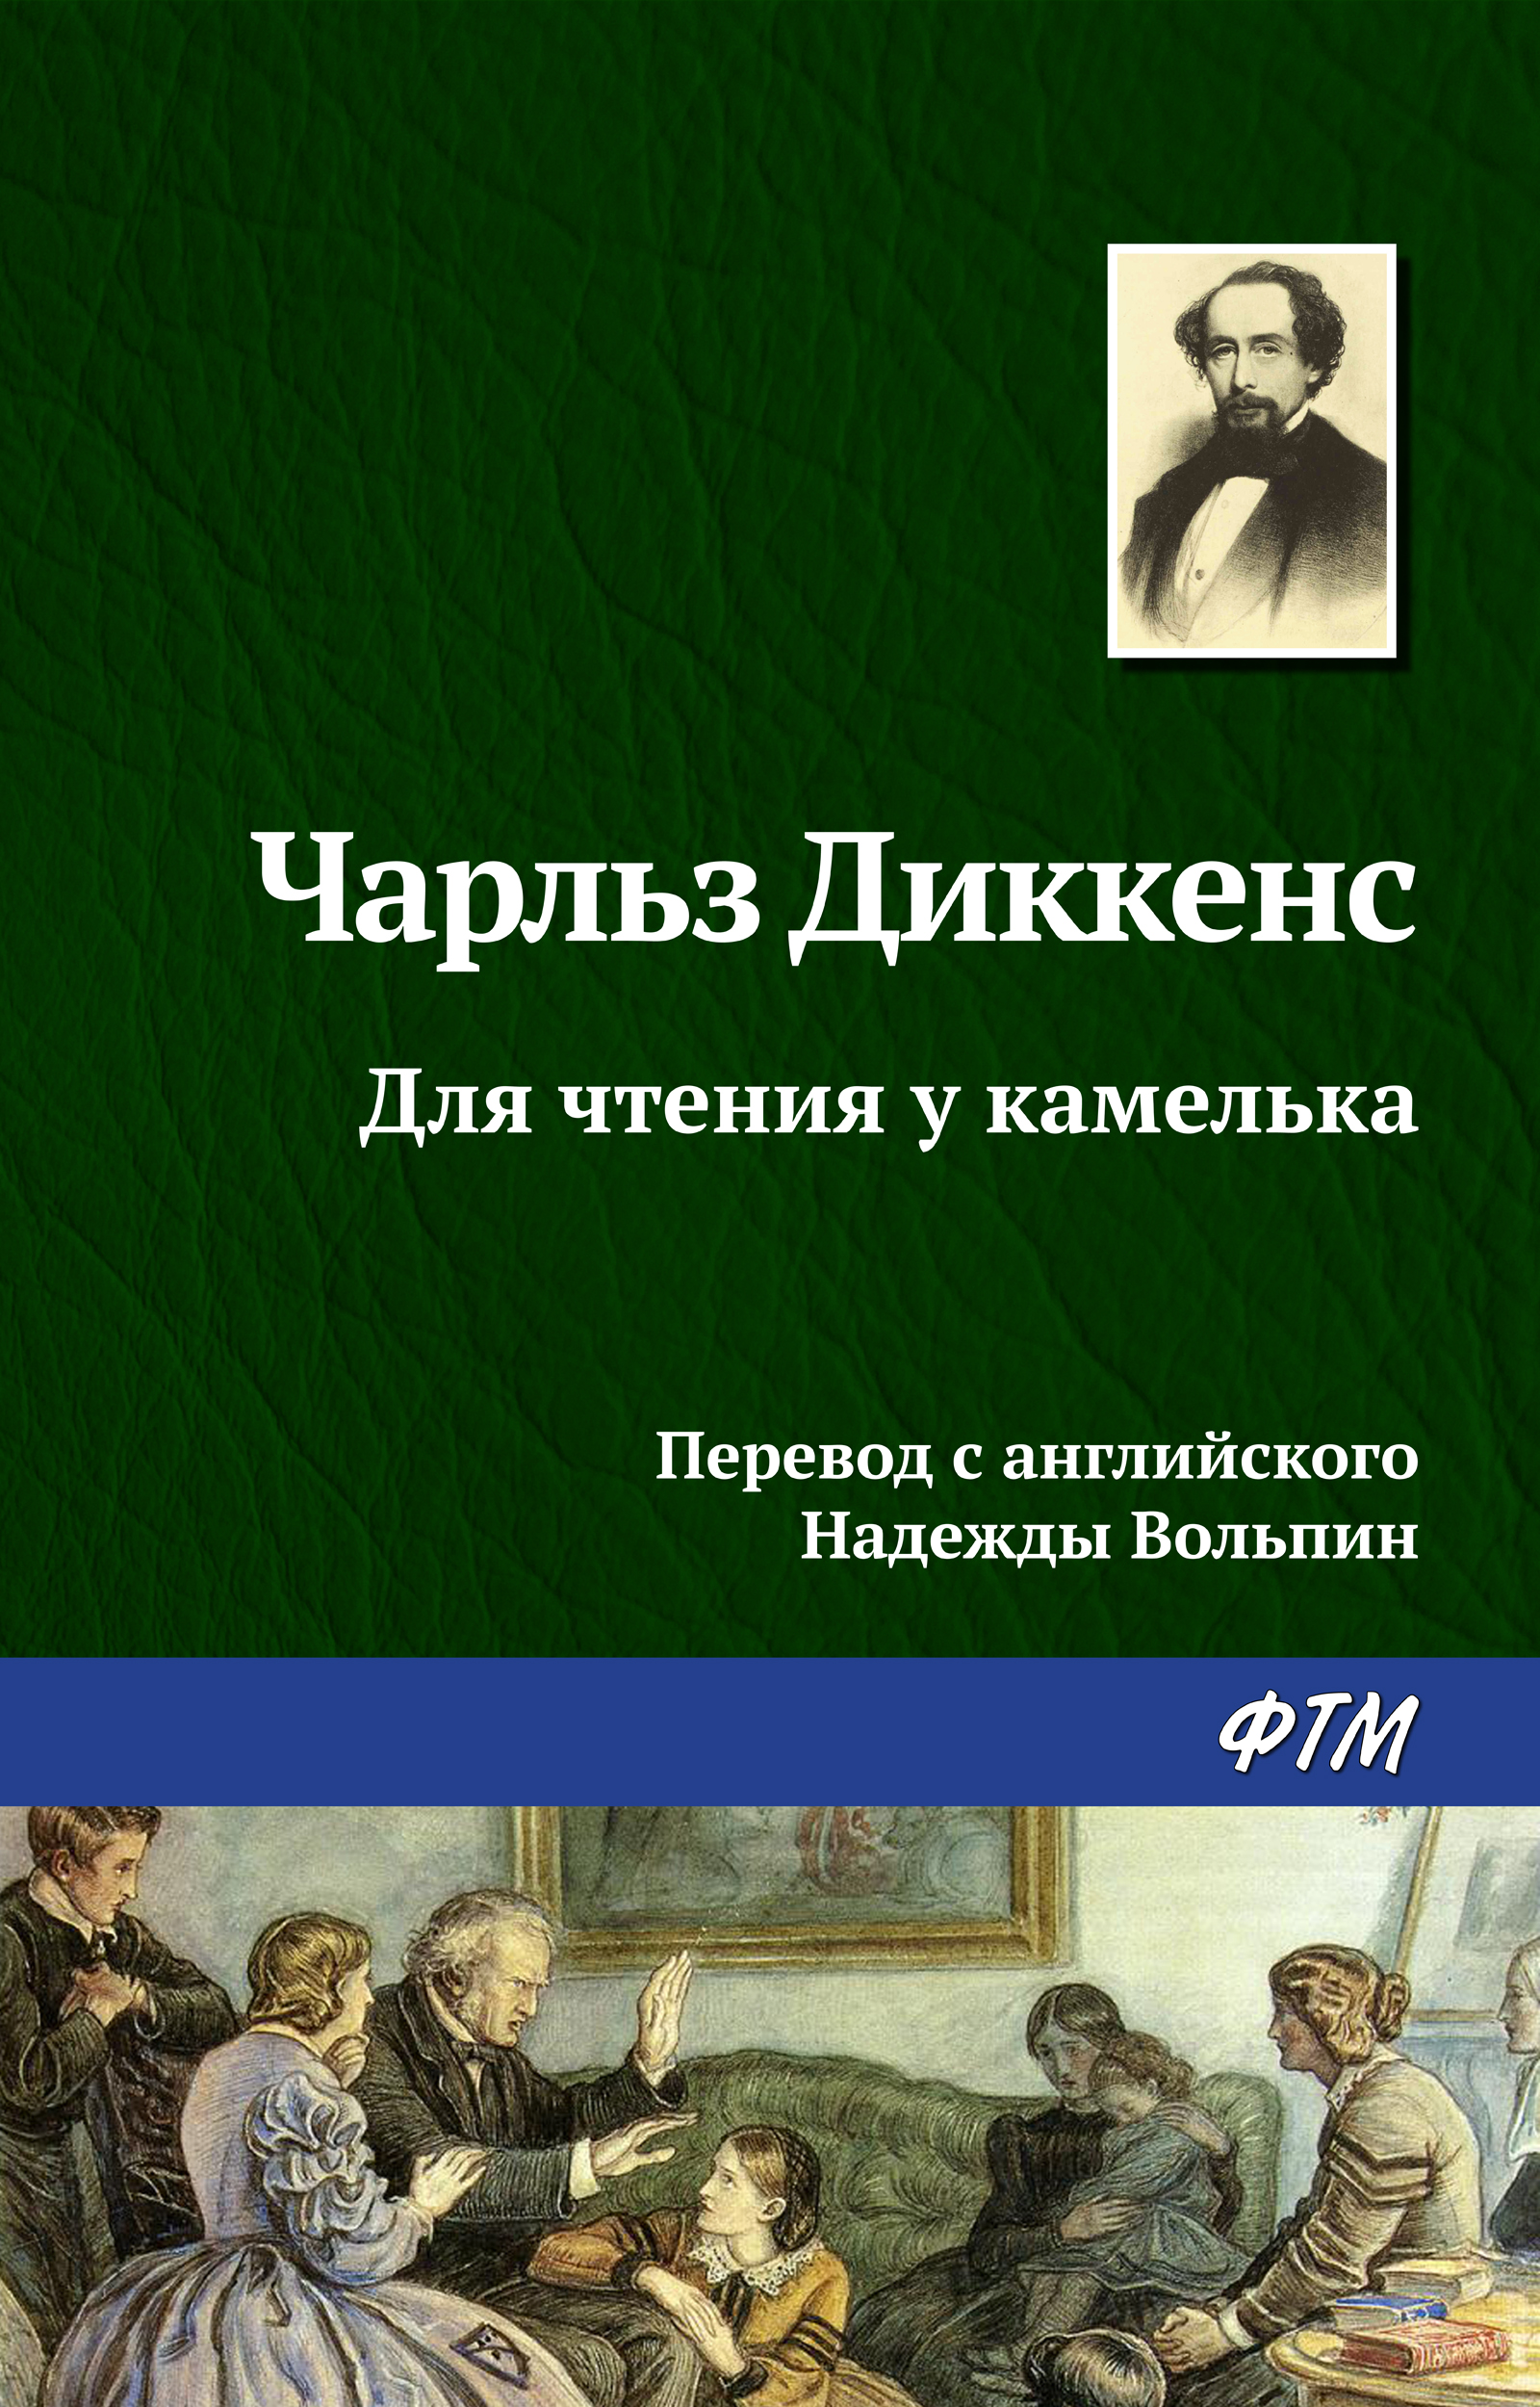 Чарльз Диккенс «Для чтения у камелька»